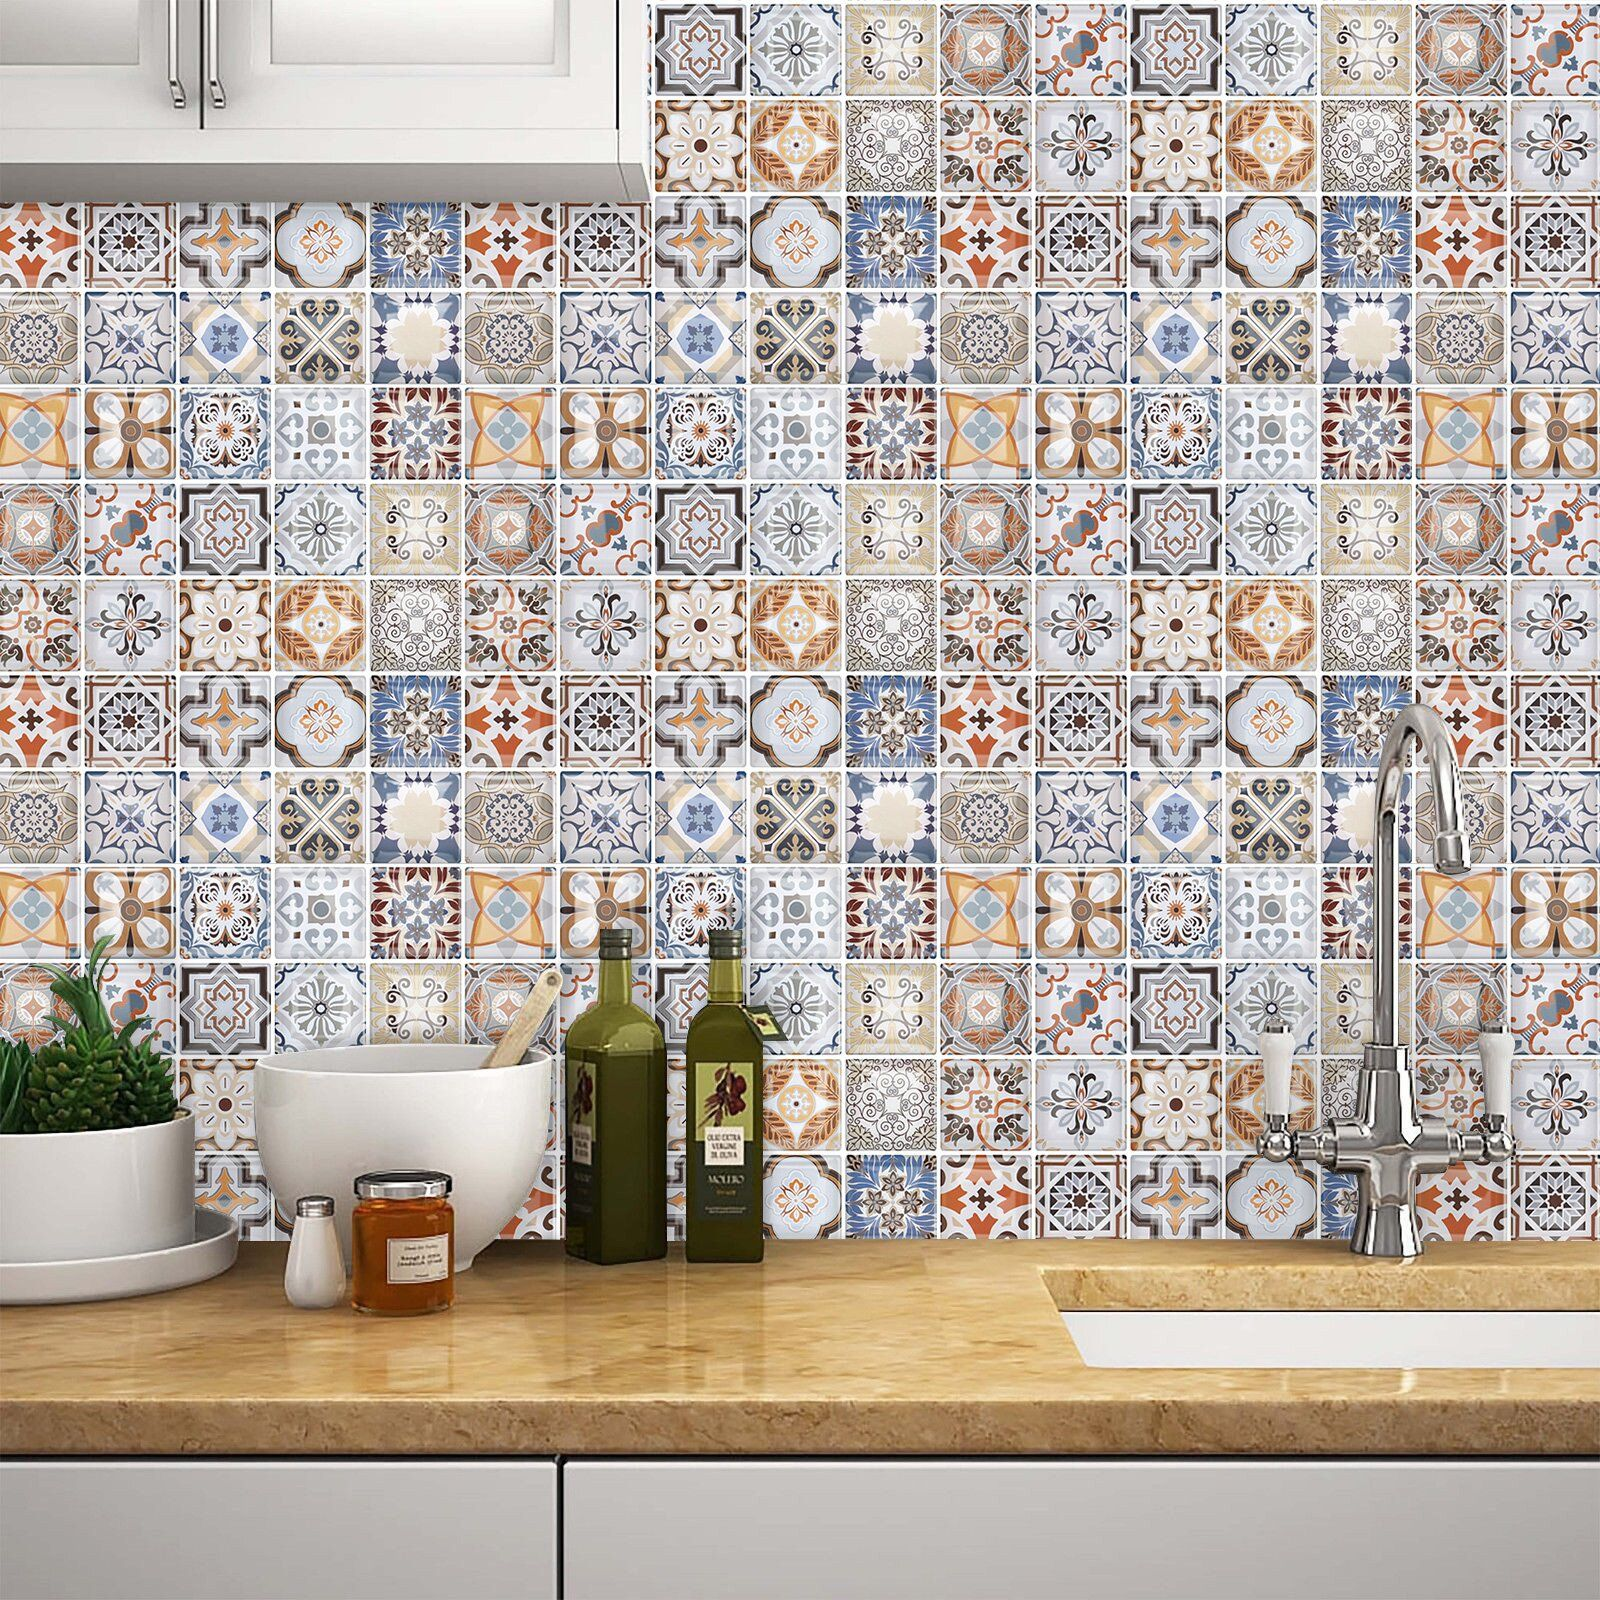 10 x 10 pvc peel stick mosaic tile